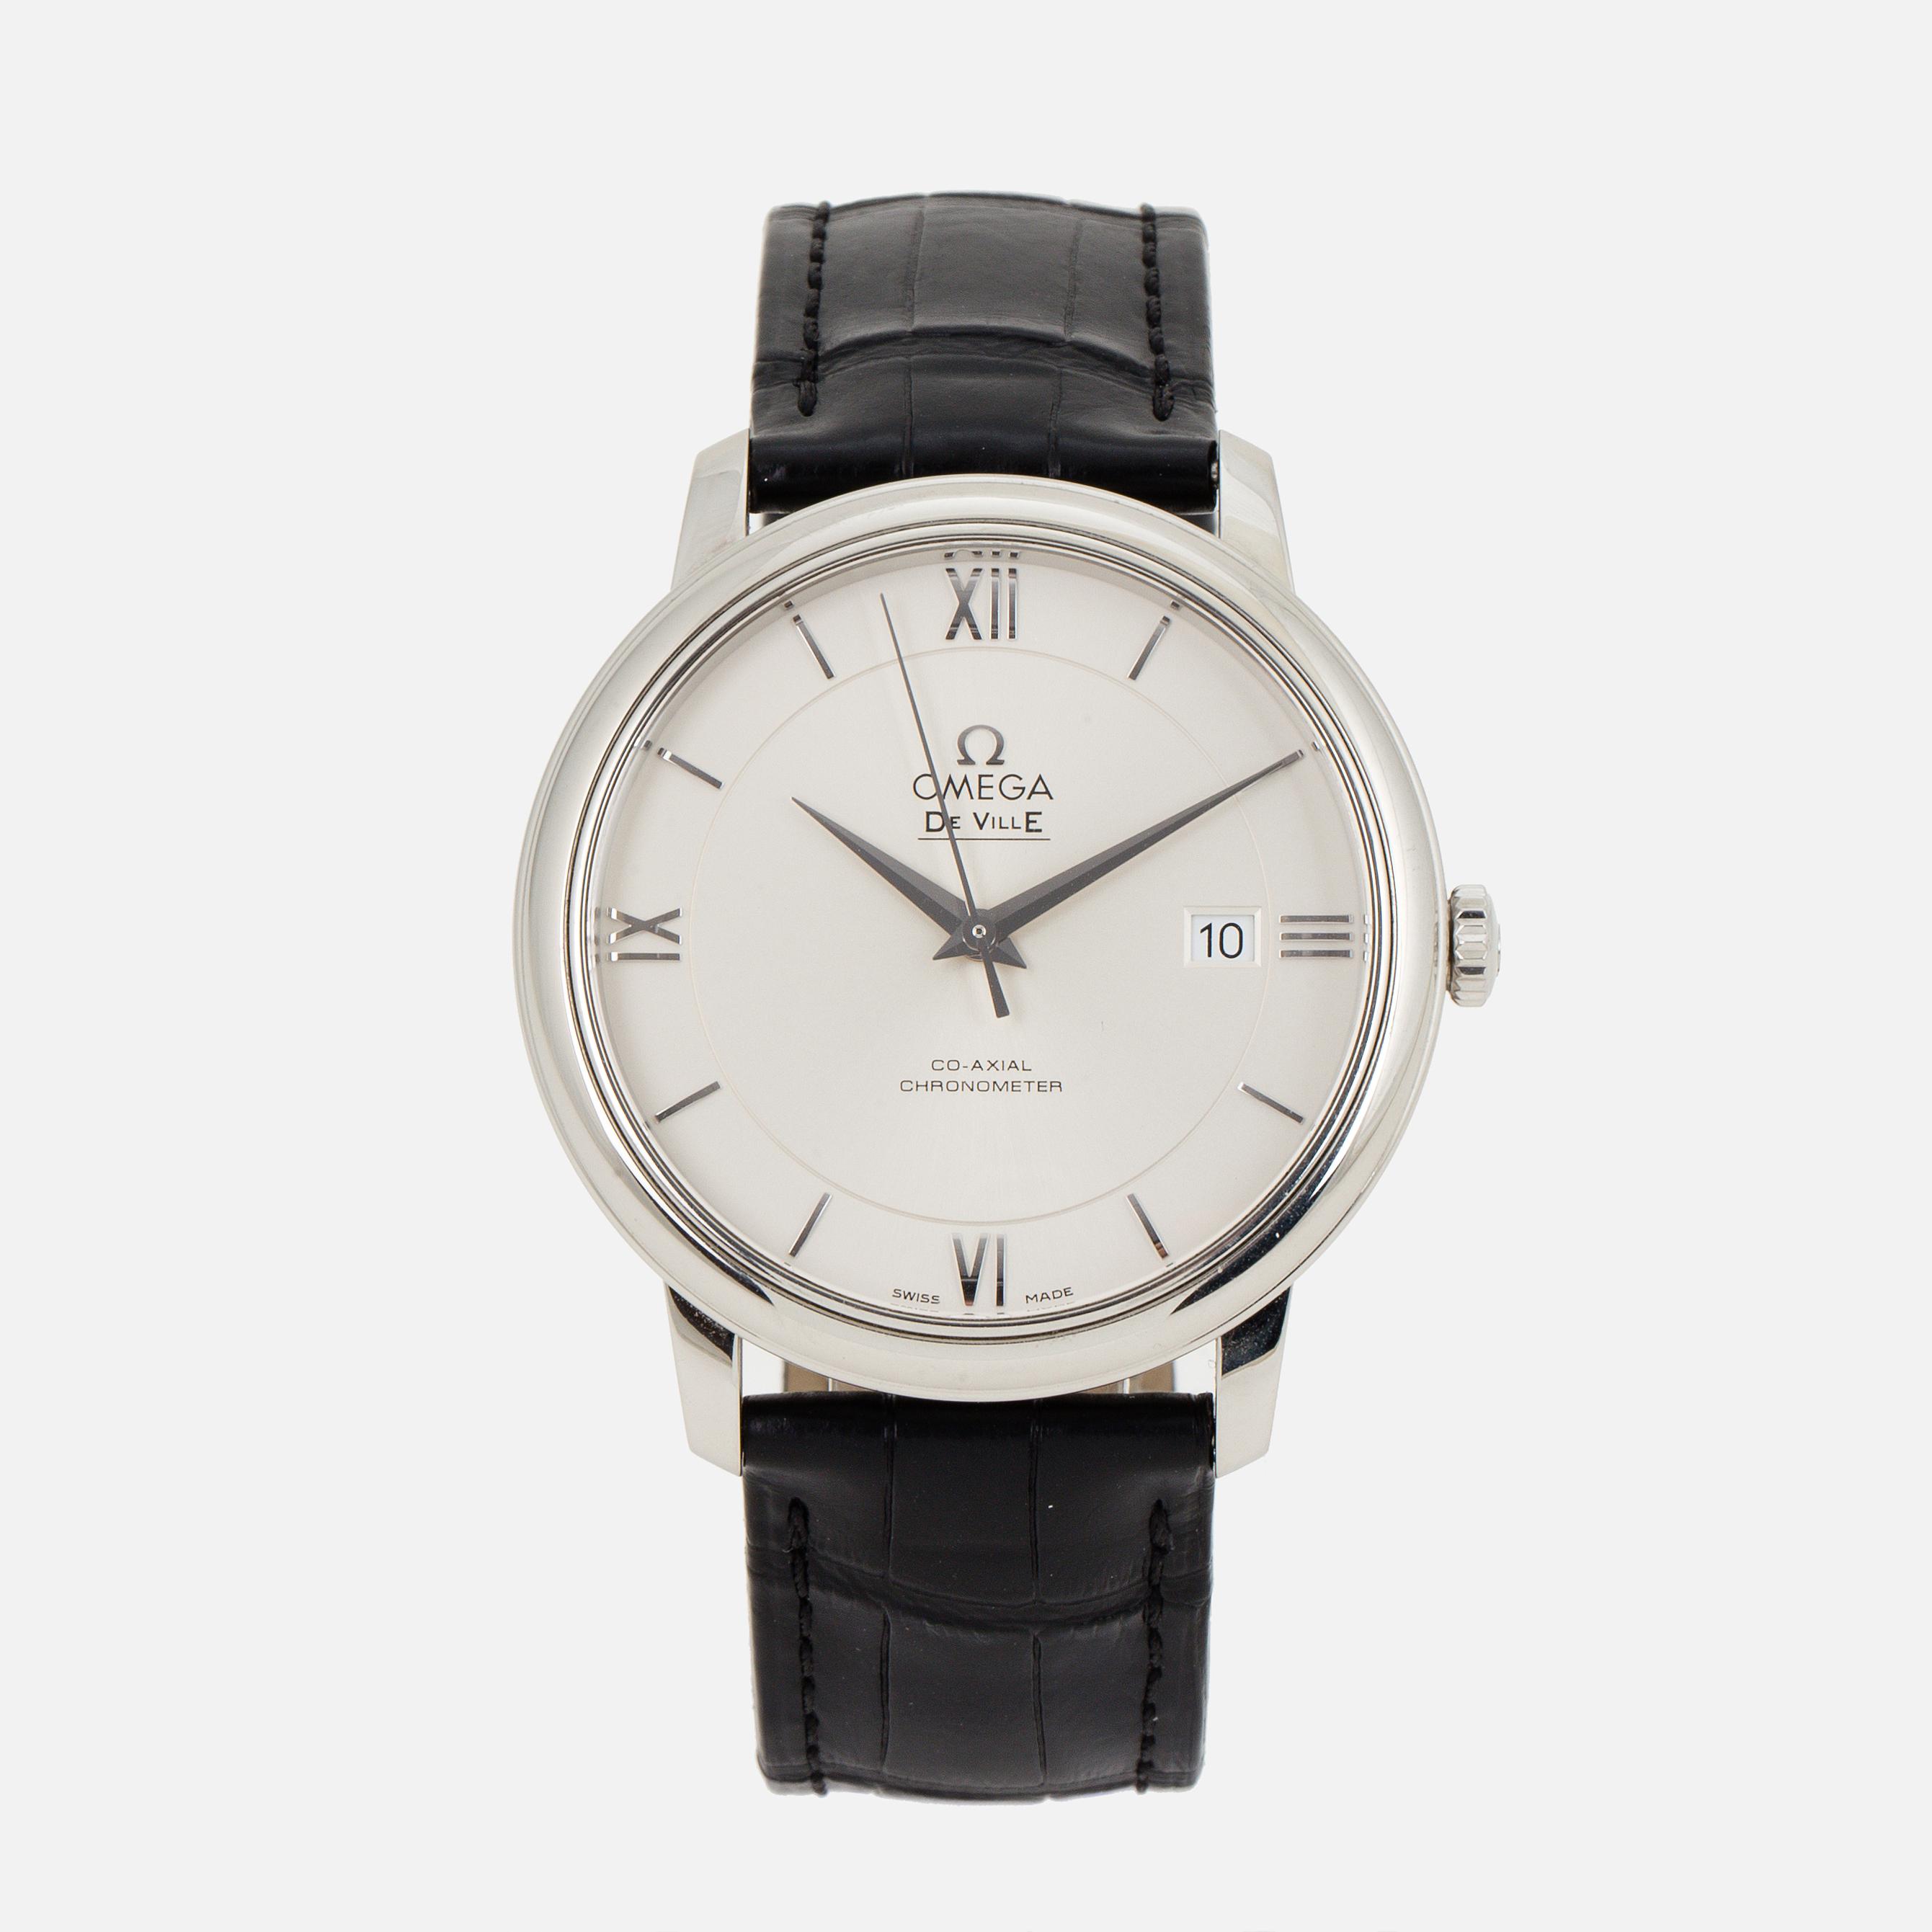 OMEGA, De Ville, New Prestige, Co-Axial, Chronometer